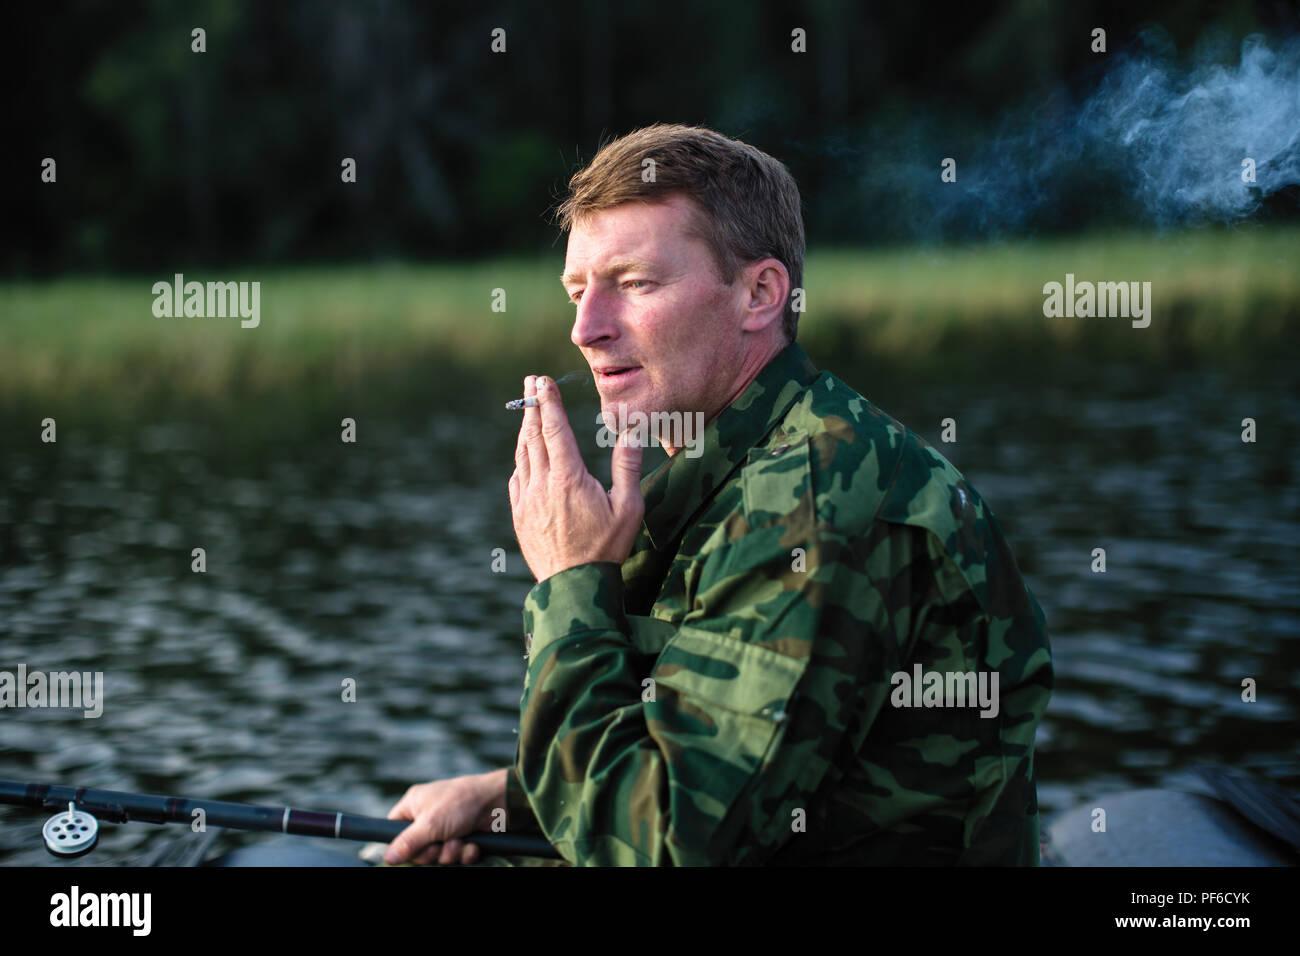 Fisherman smoking, camouflage clothing. - Stock Image